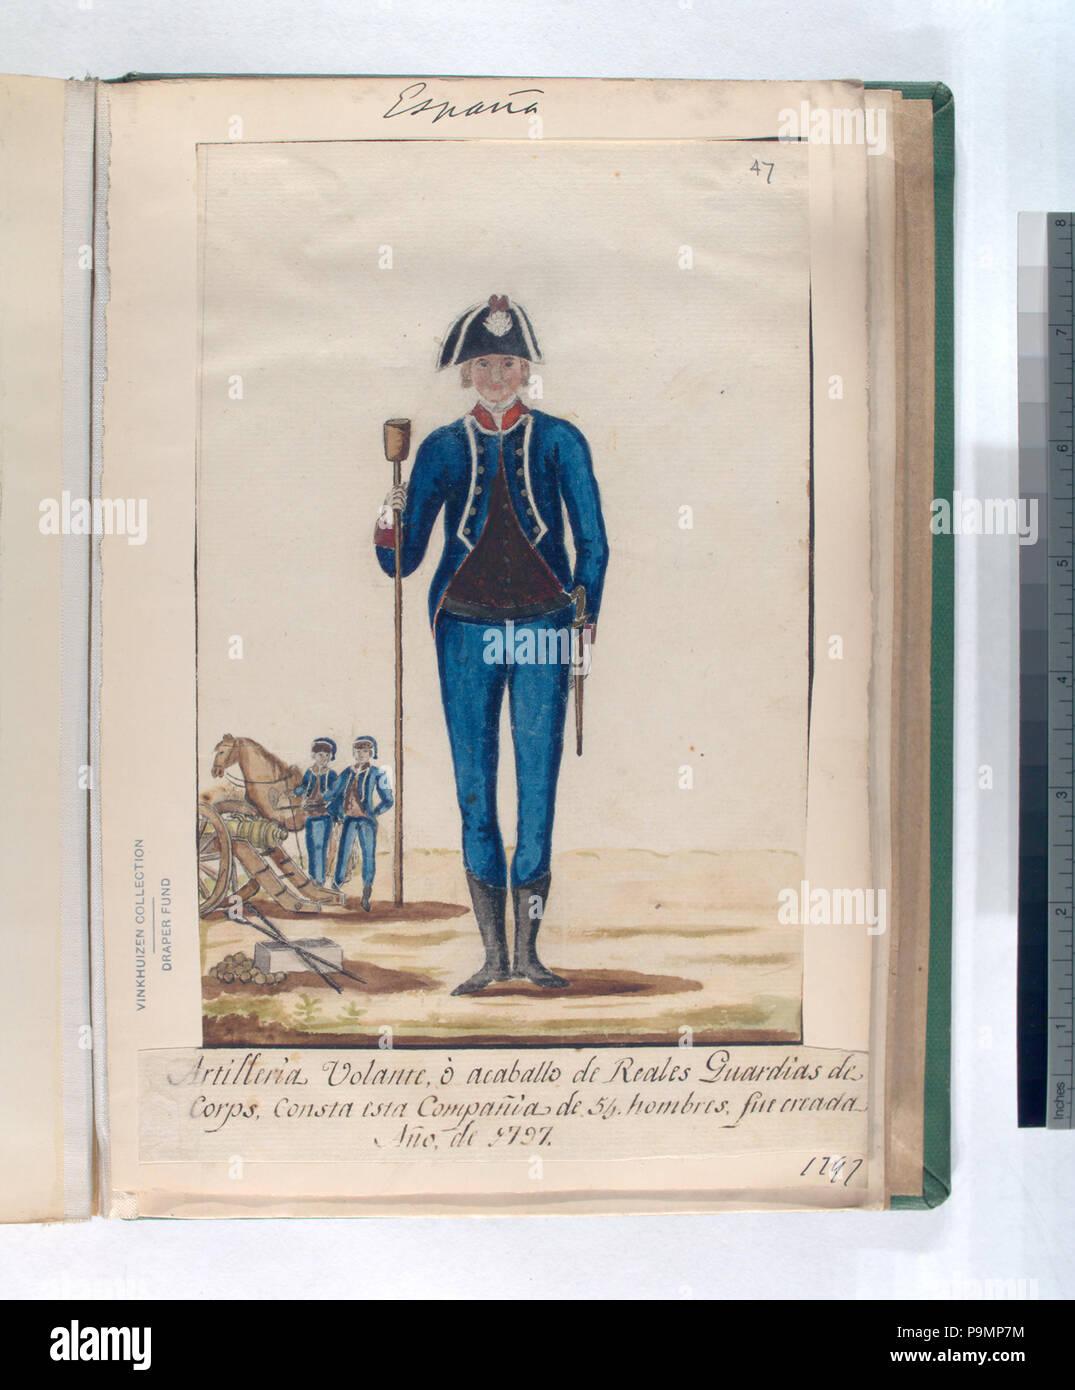 159 Artilleria Volante, ó acaballo de Reales Guardias de Corps. Consta esta Compañia de 54 hombres, fue creada Año, de 1797 (1797) (NYPL b14896507-87746) - Stock Image